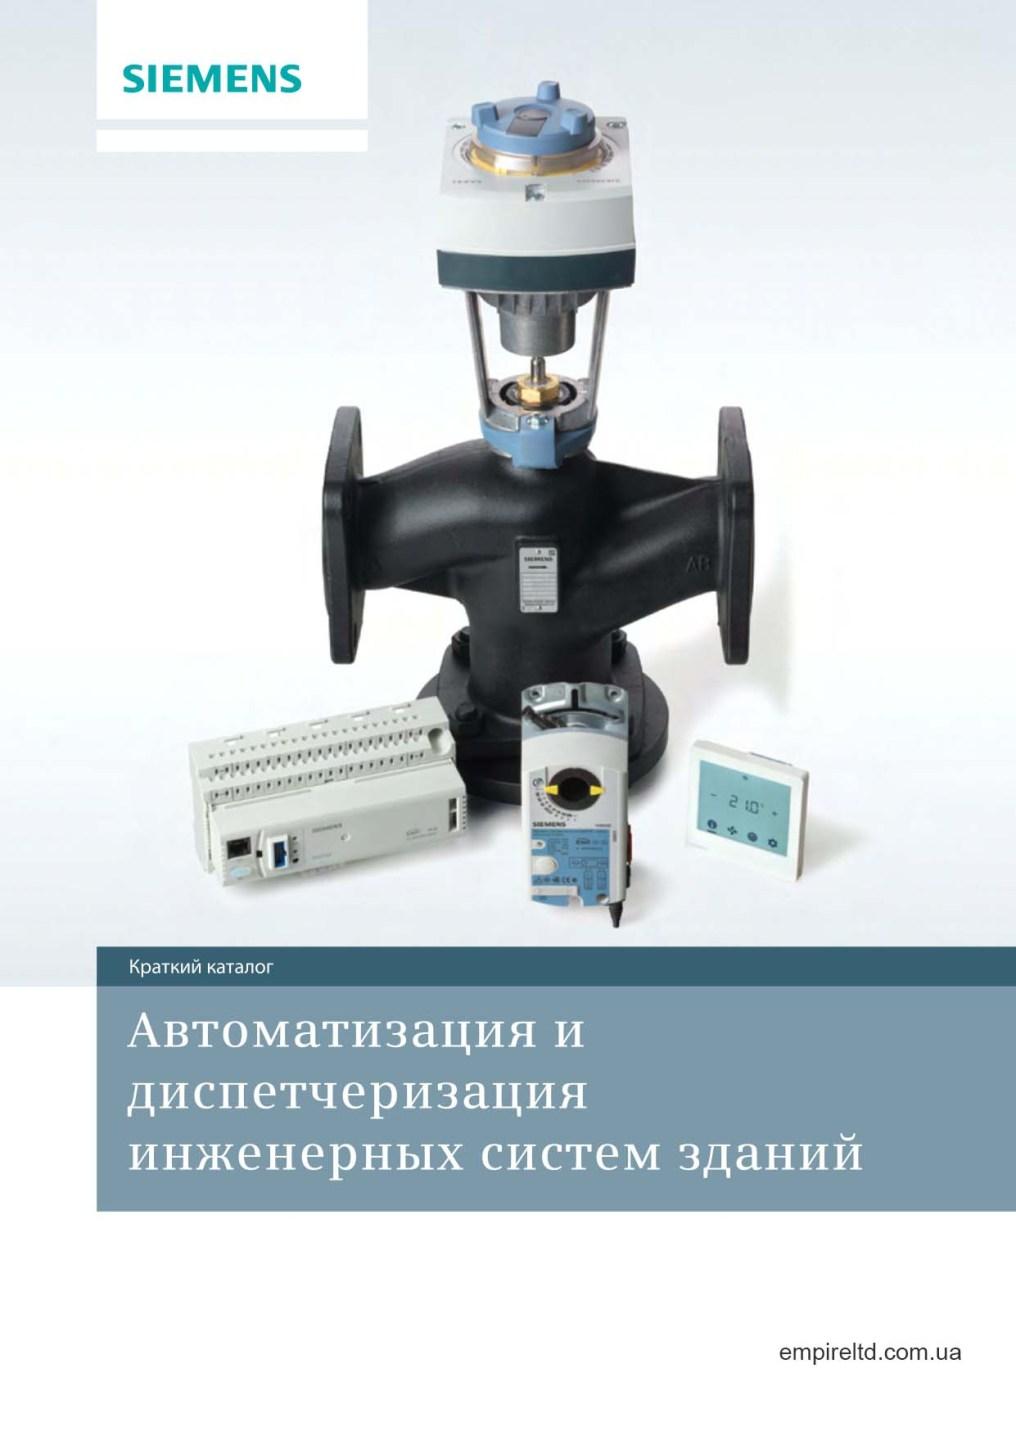 siemens-kiev-ukraine-0001